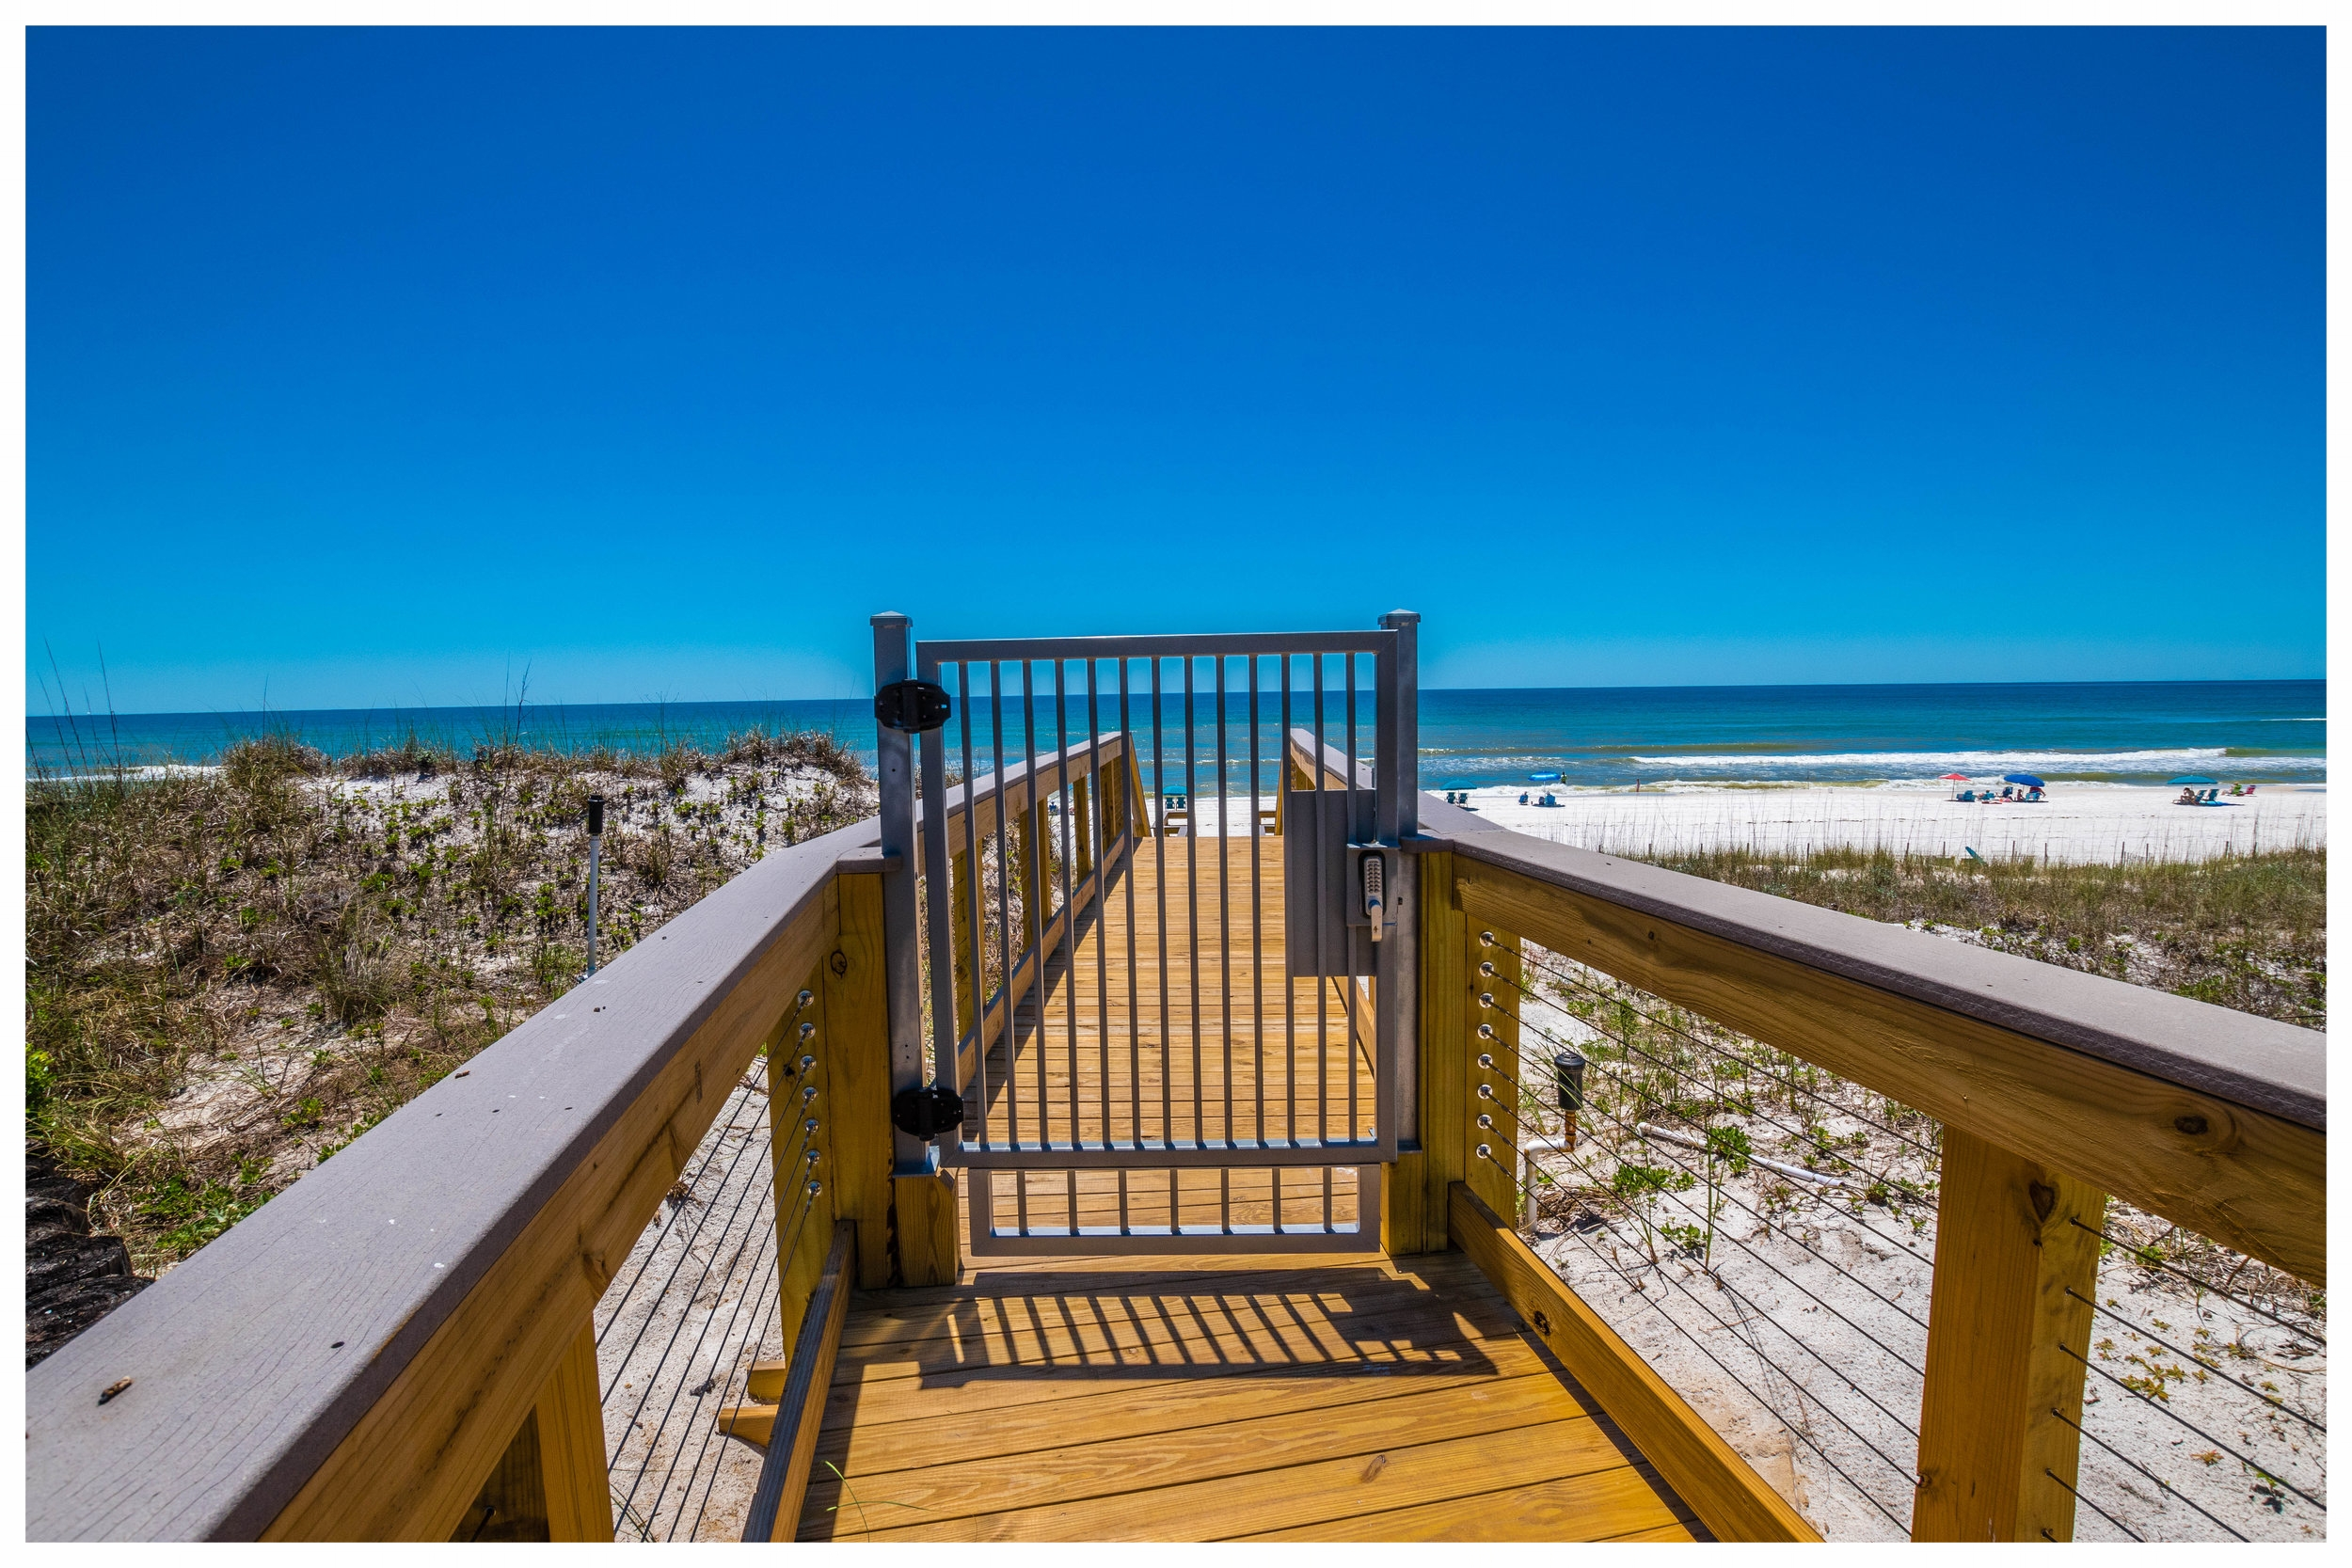 Beach Boardwalk Construction Company